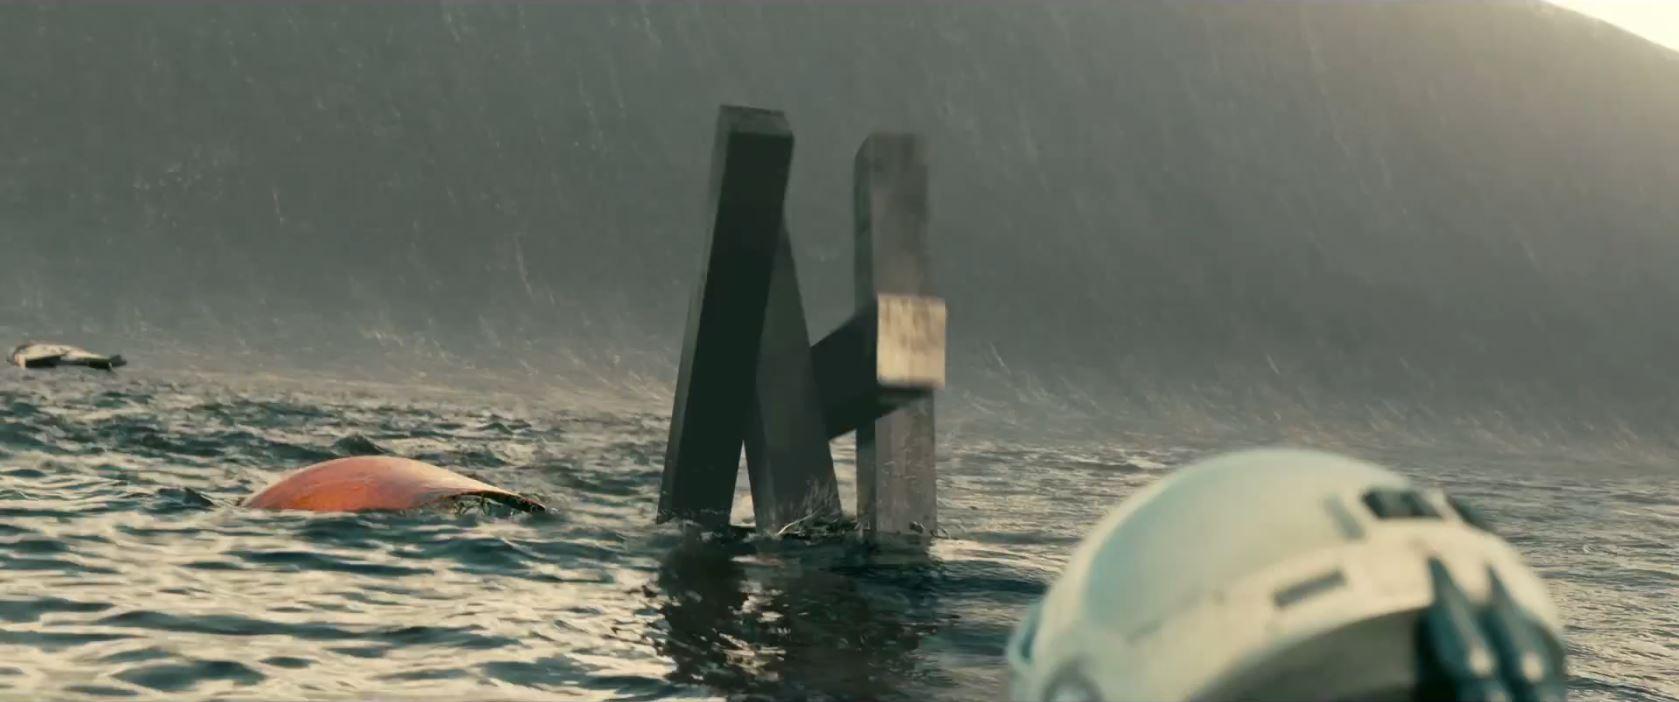 Interstellar-trailer-Science-Fiction-elements